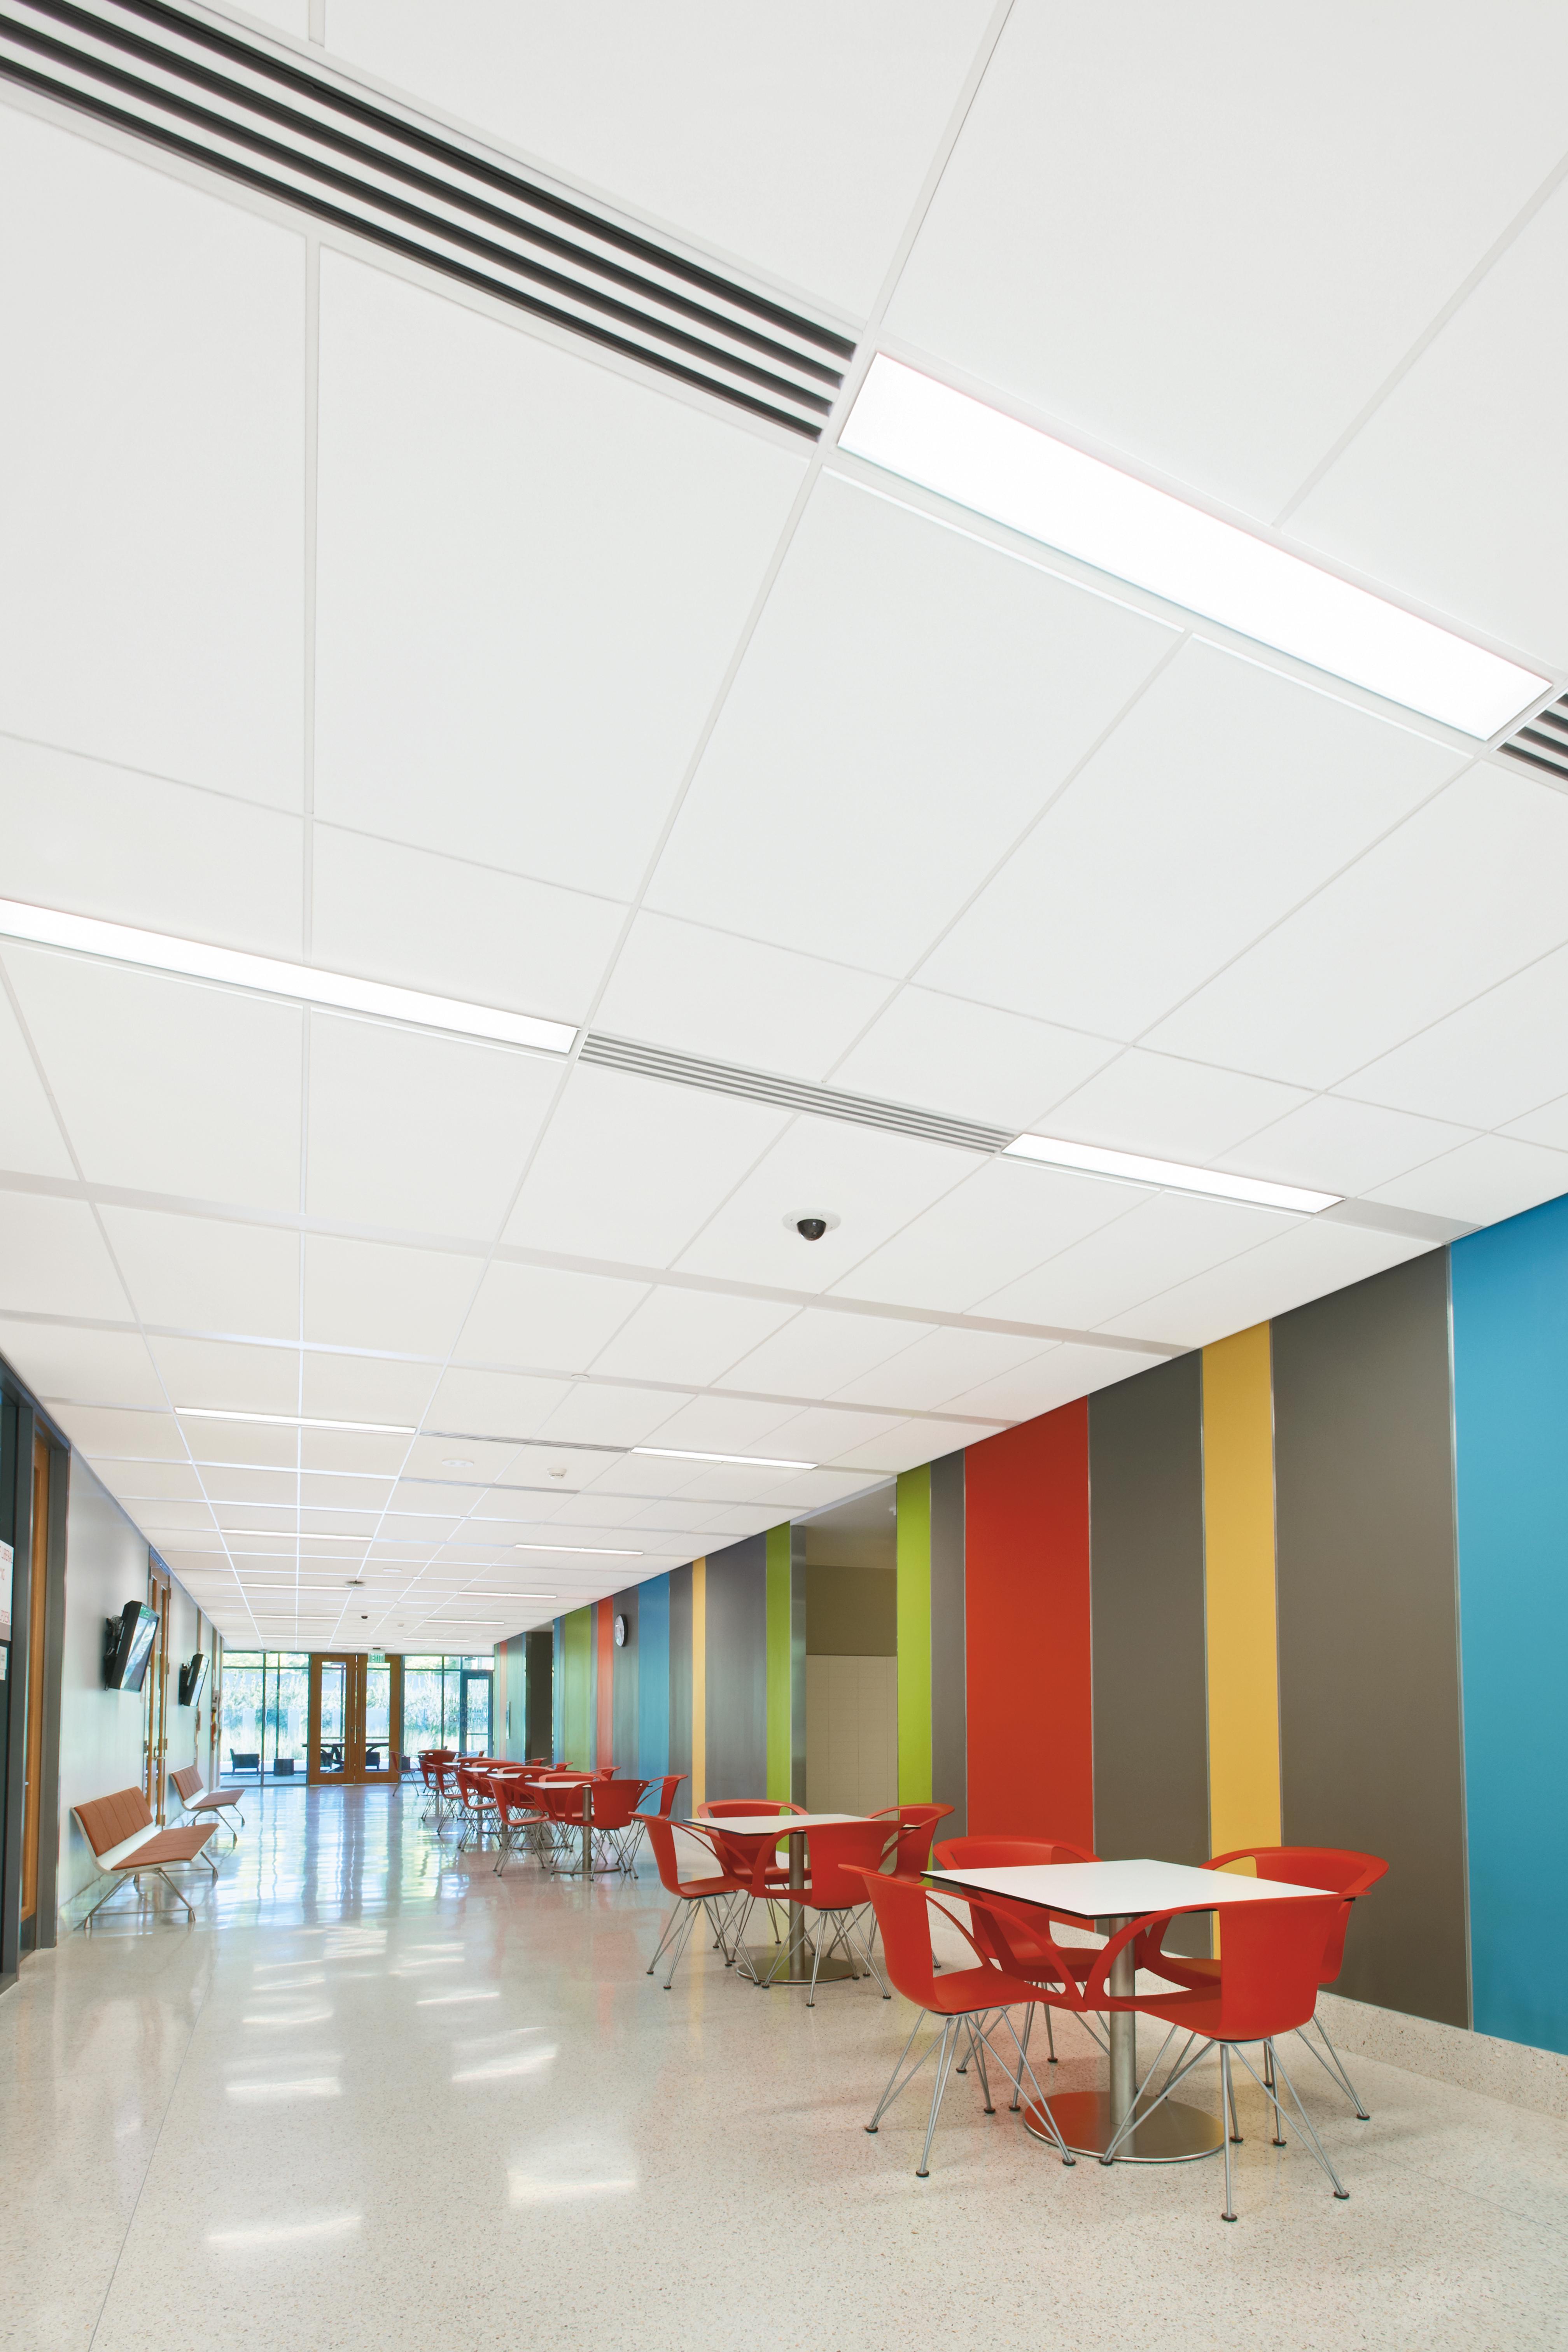 Cute 12X12 Cork Floor Tiles Big 18 X 18 Ceramic Floor Tile Regular 2 Inch Hexagon Floor Tile 2 X 12 Subway Tile Old 2 X 4 Ceiling Tiles Dark2 X 4 Subway Tile Linear Lighting Integration | Armstrong Ceiling Solutions \u2013 Commercial